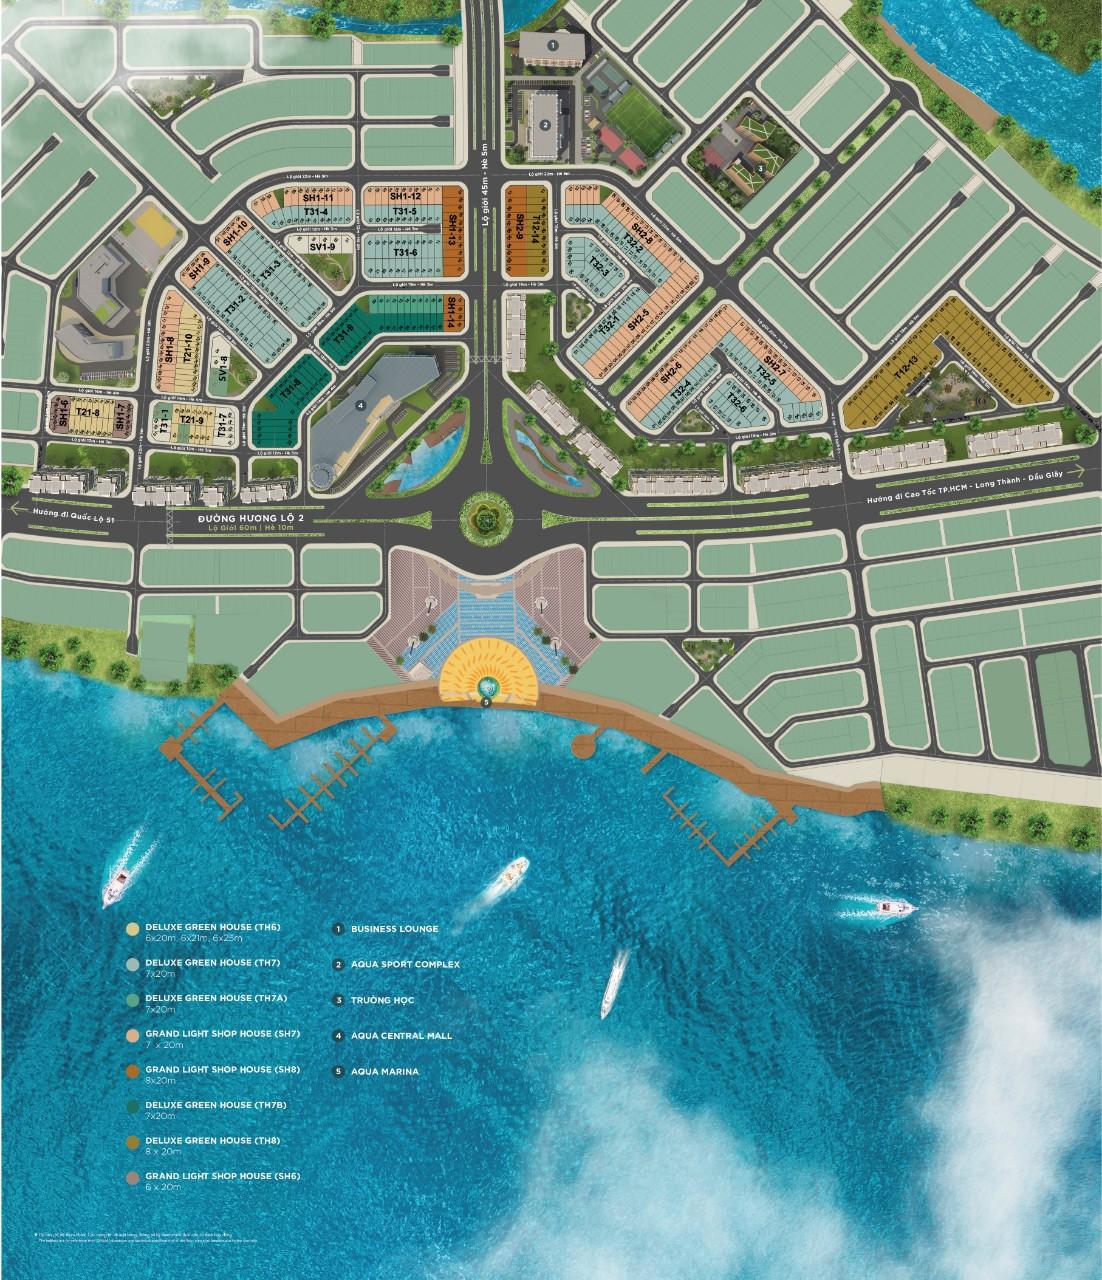 Mặt bằng Sunharbor 2 và Sunharbo 3 dự án Aqua City